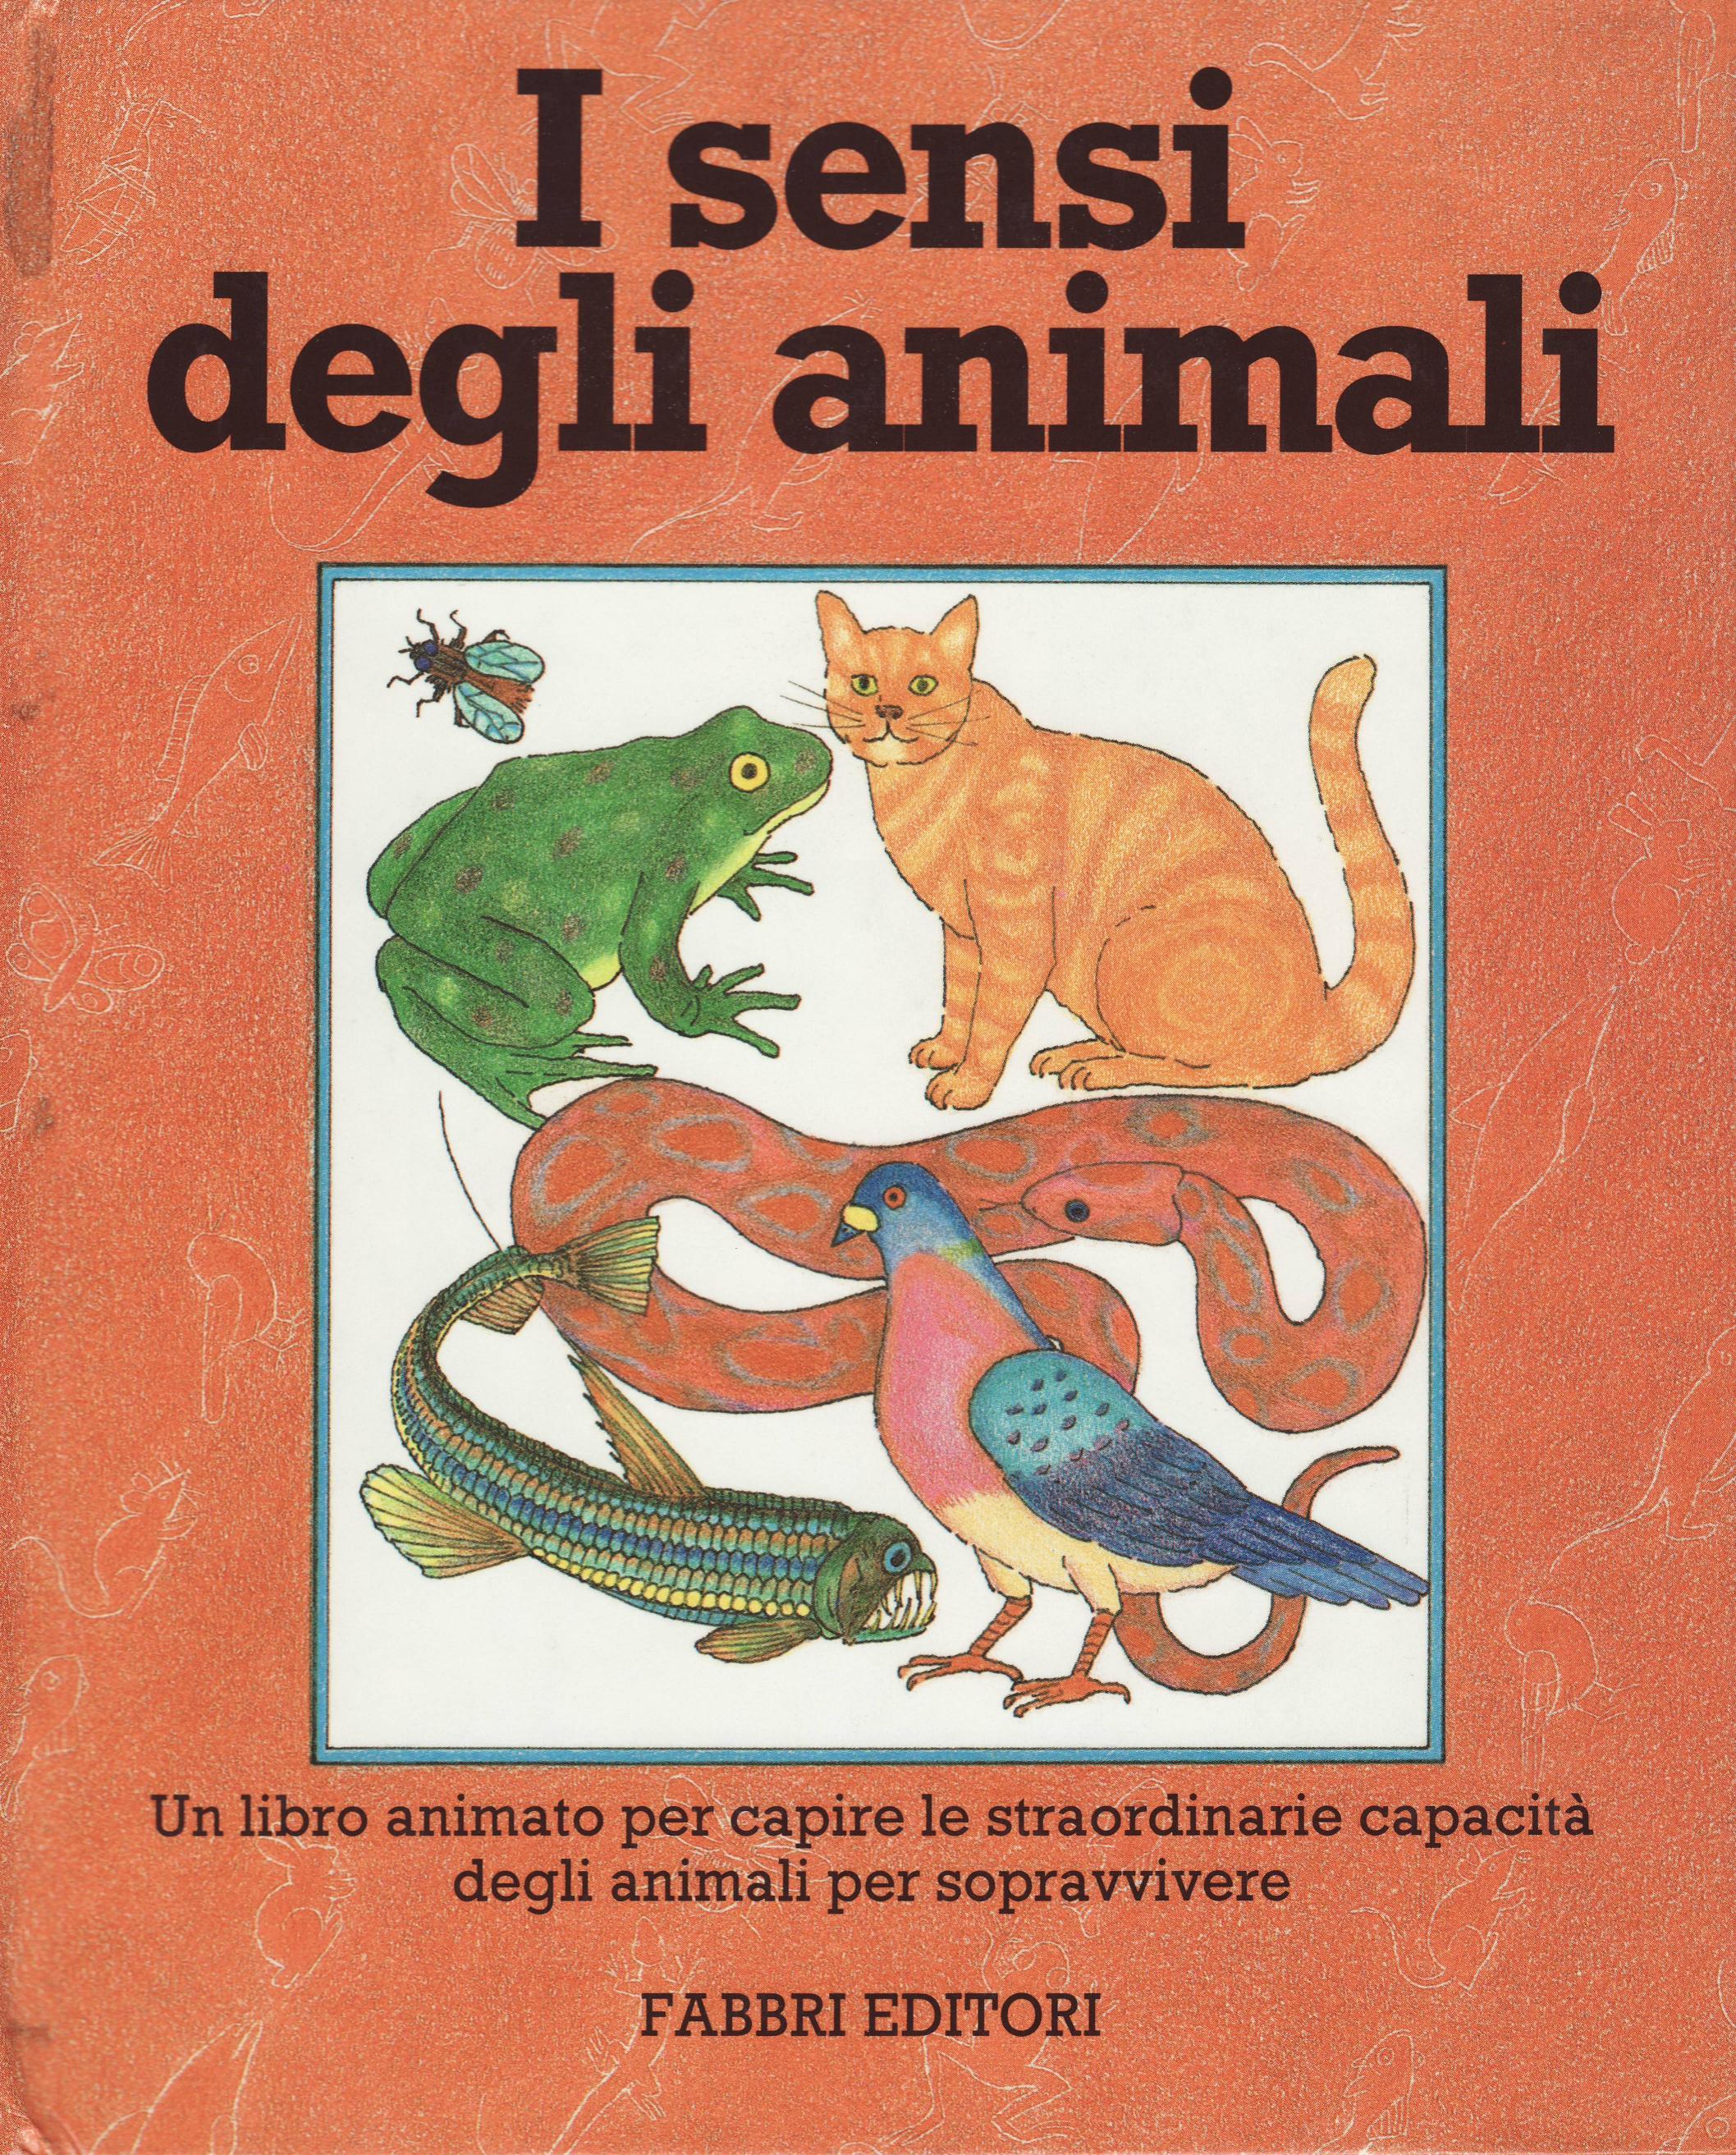 I sensi degli animali